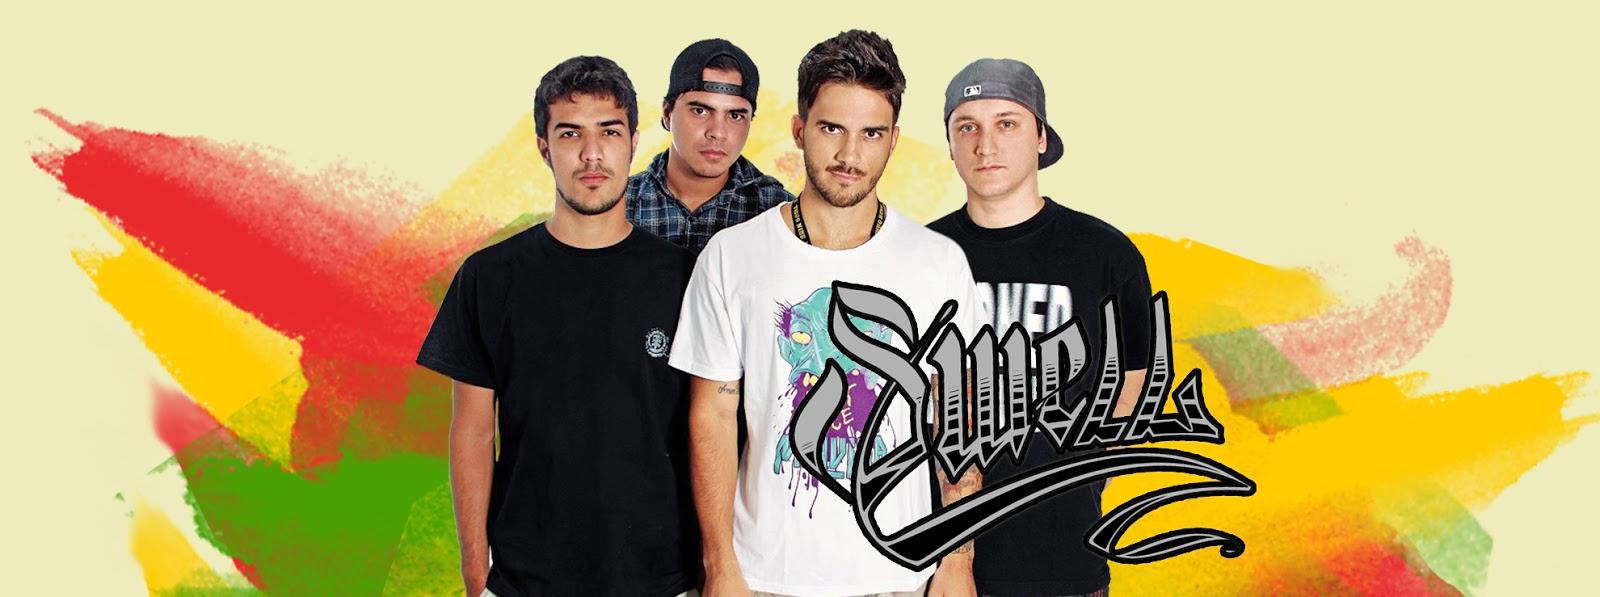 SWELL Banda 2013 (Oficial)